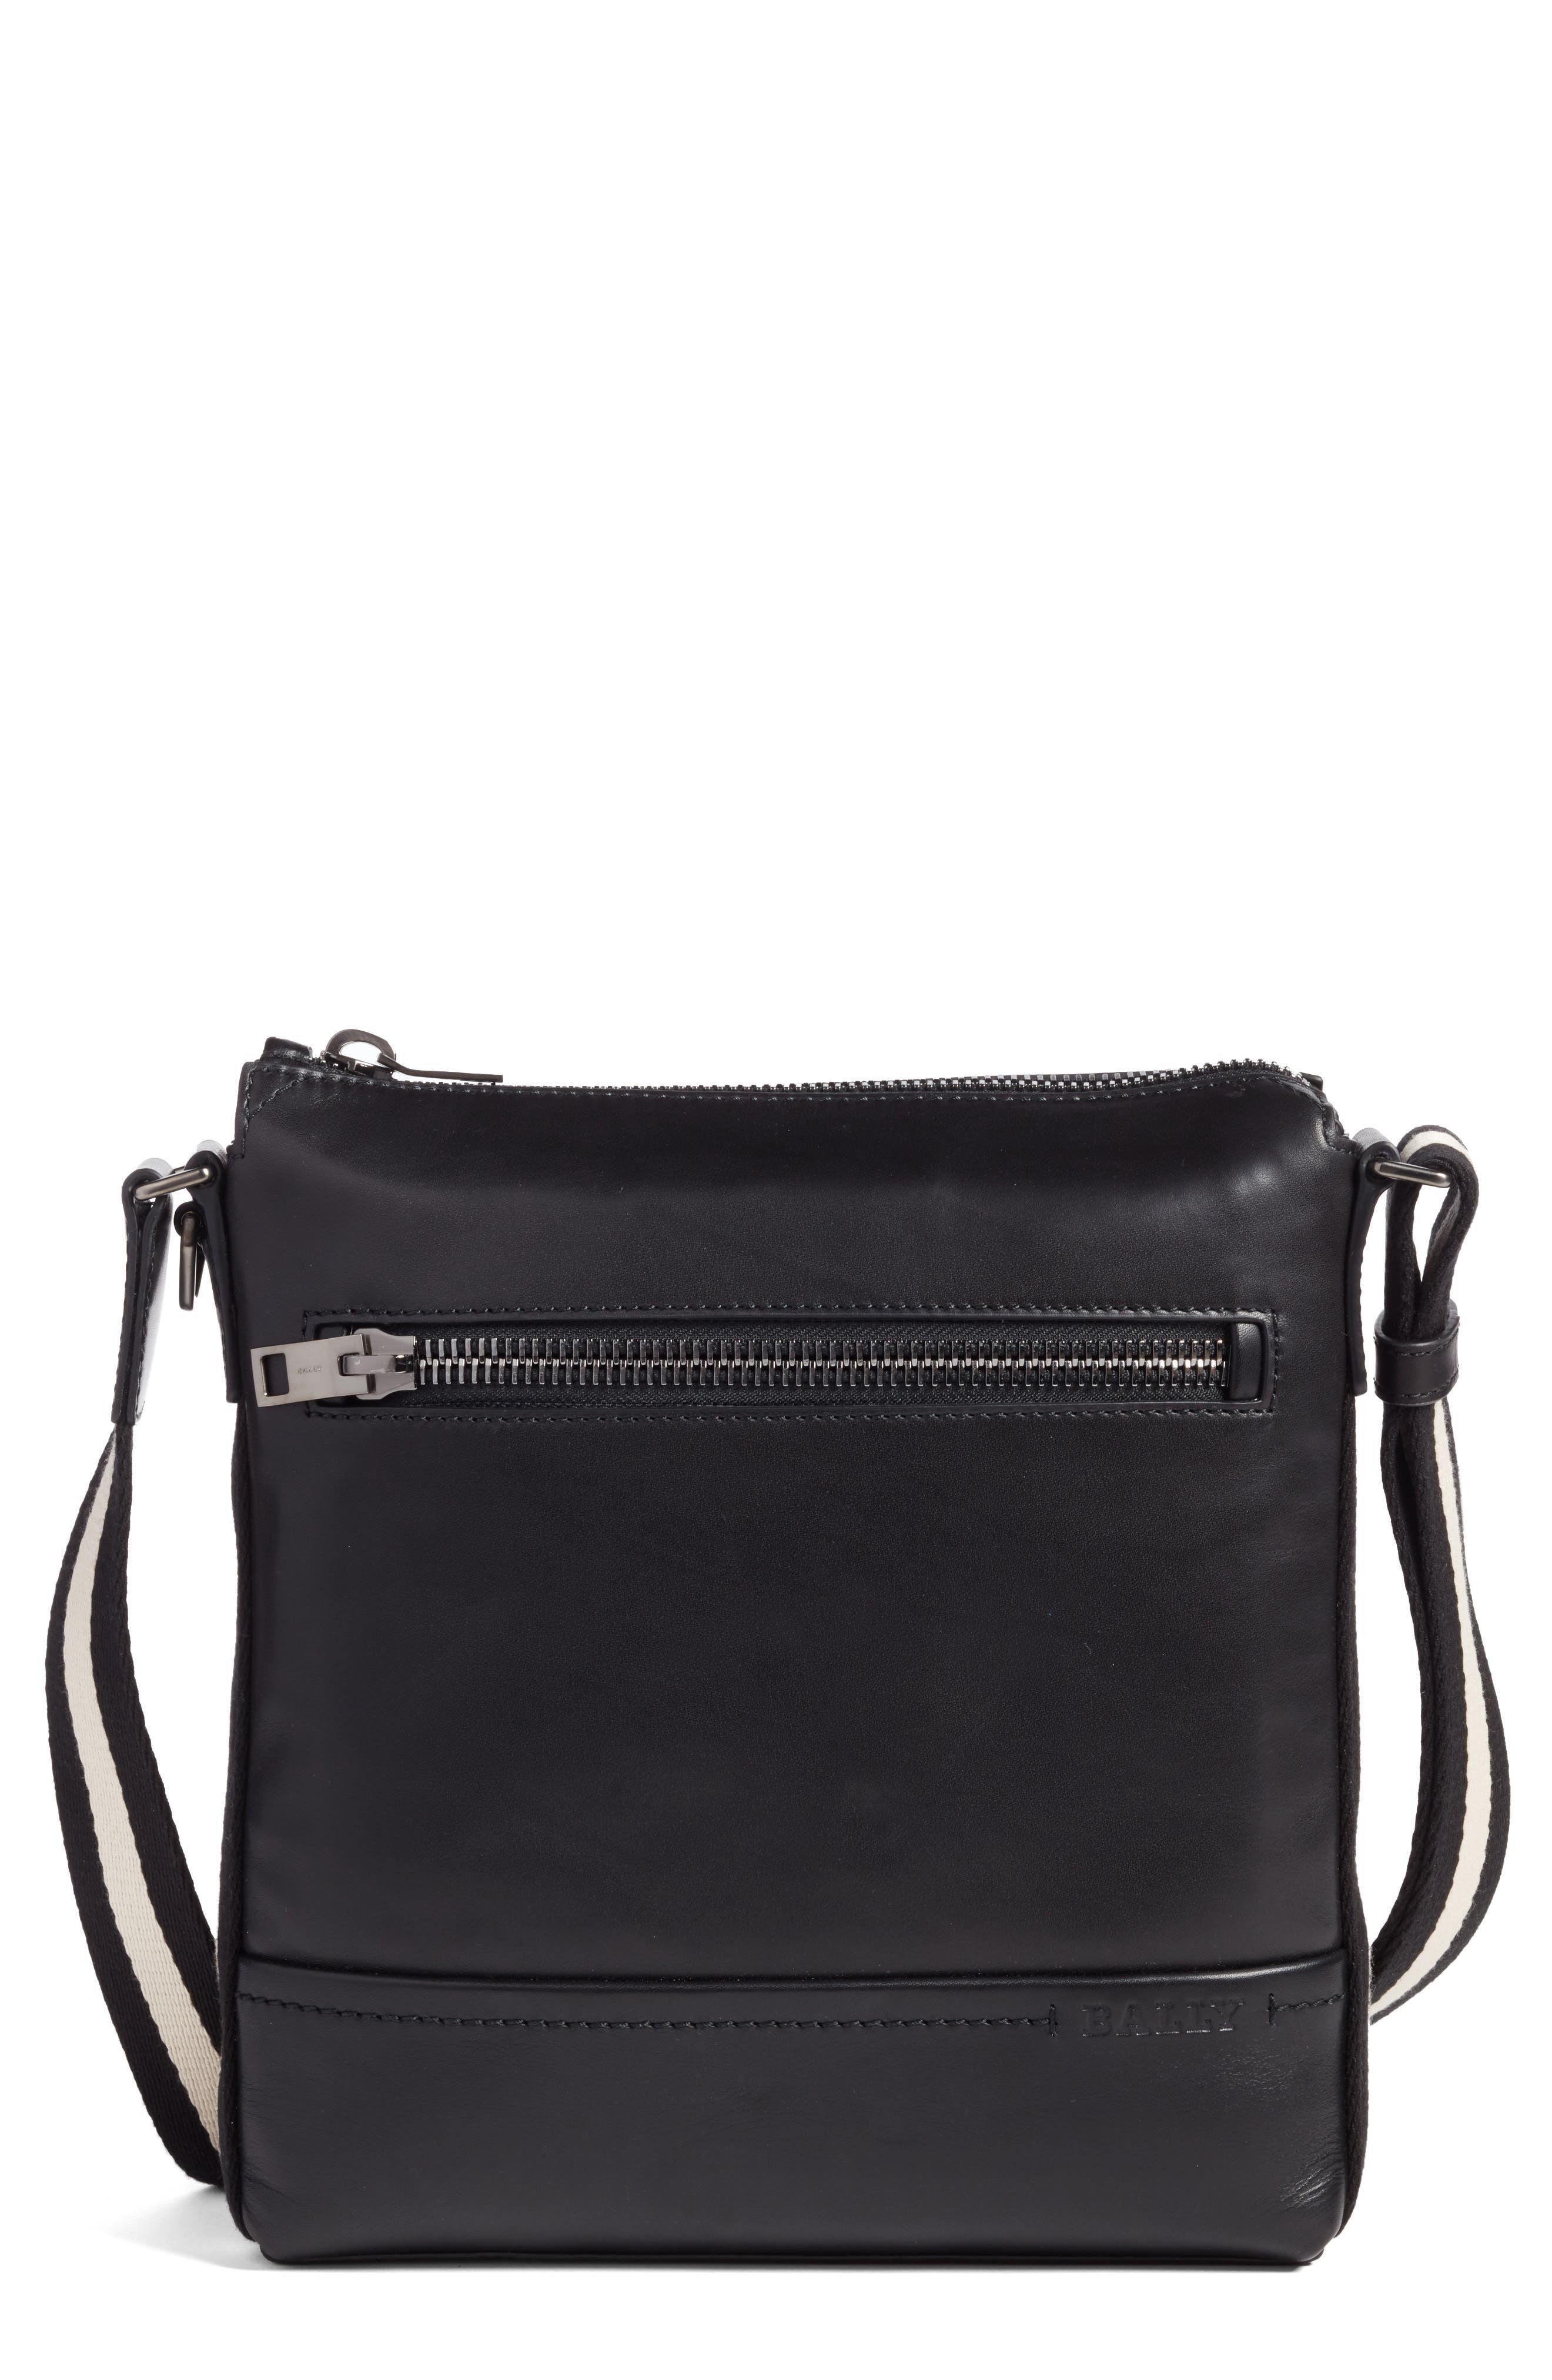 BALLY,                             Trezzini Leather Crossbody Bag,                             Main thumbnail 1, color,                             001